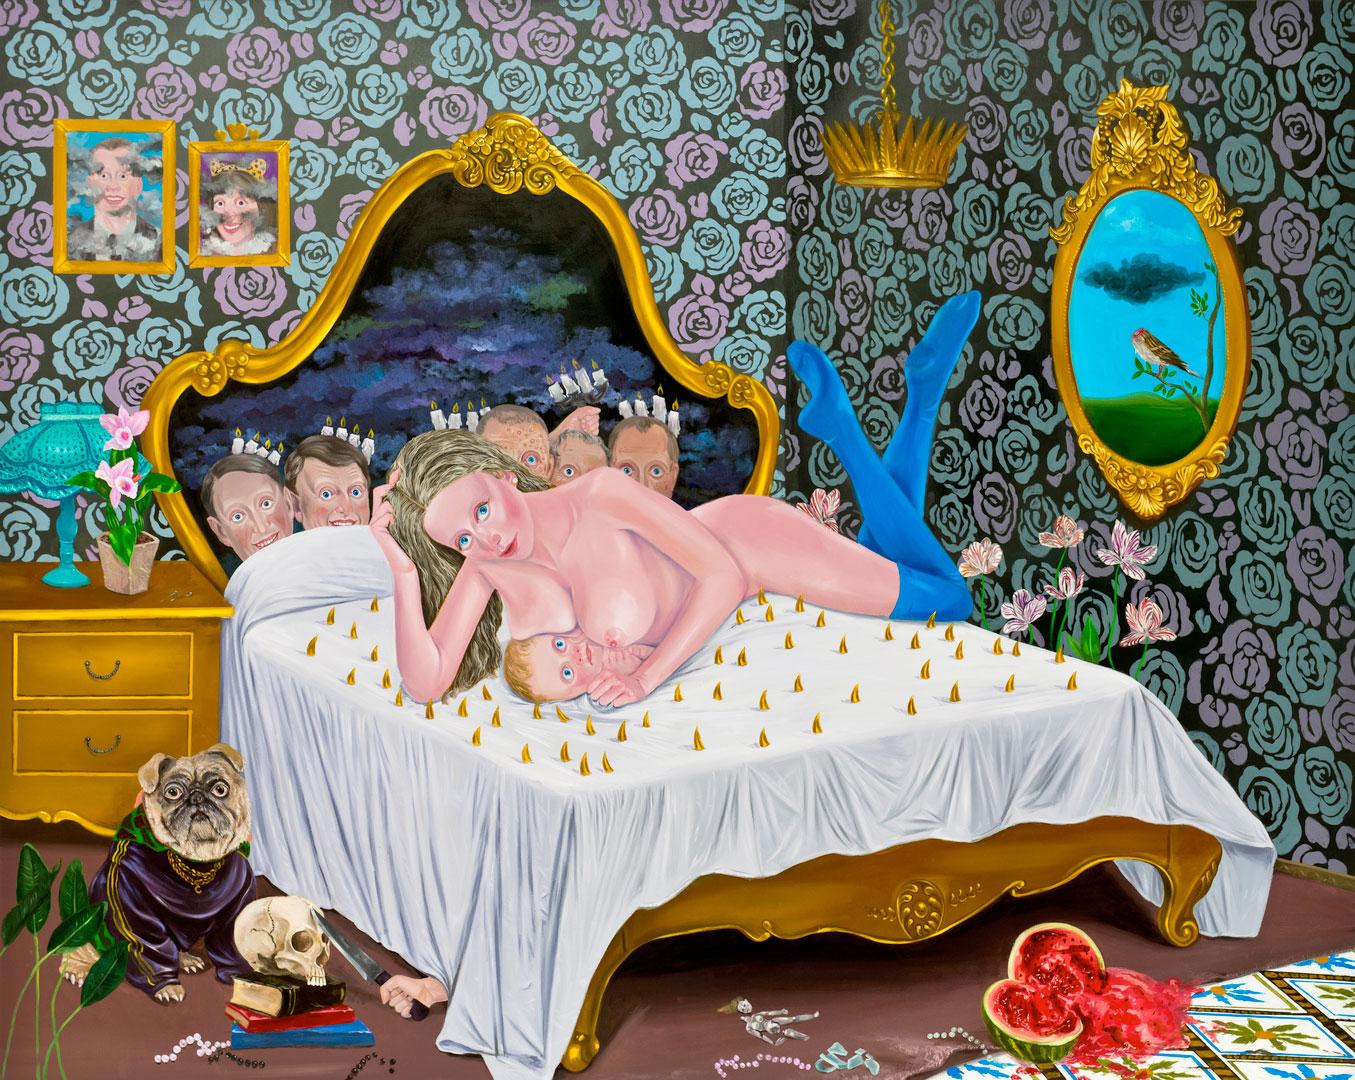 Kill Him Make Me Laugh III, 175x220cm, oil on canvas, 2014  (Private Collection)